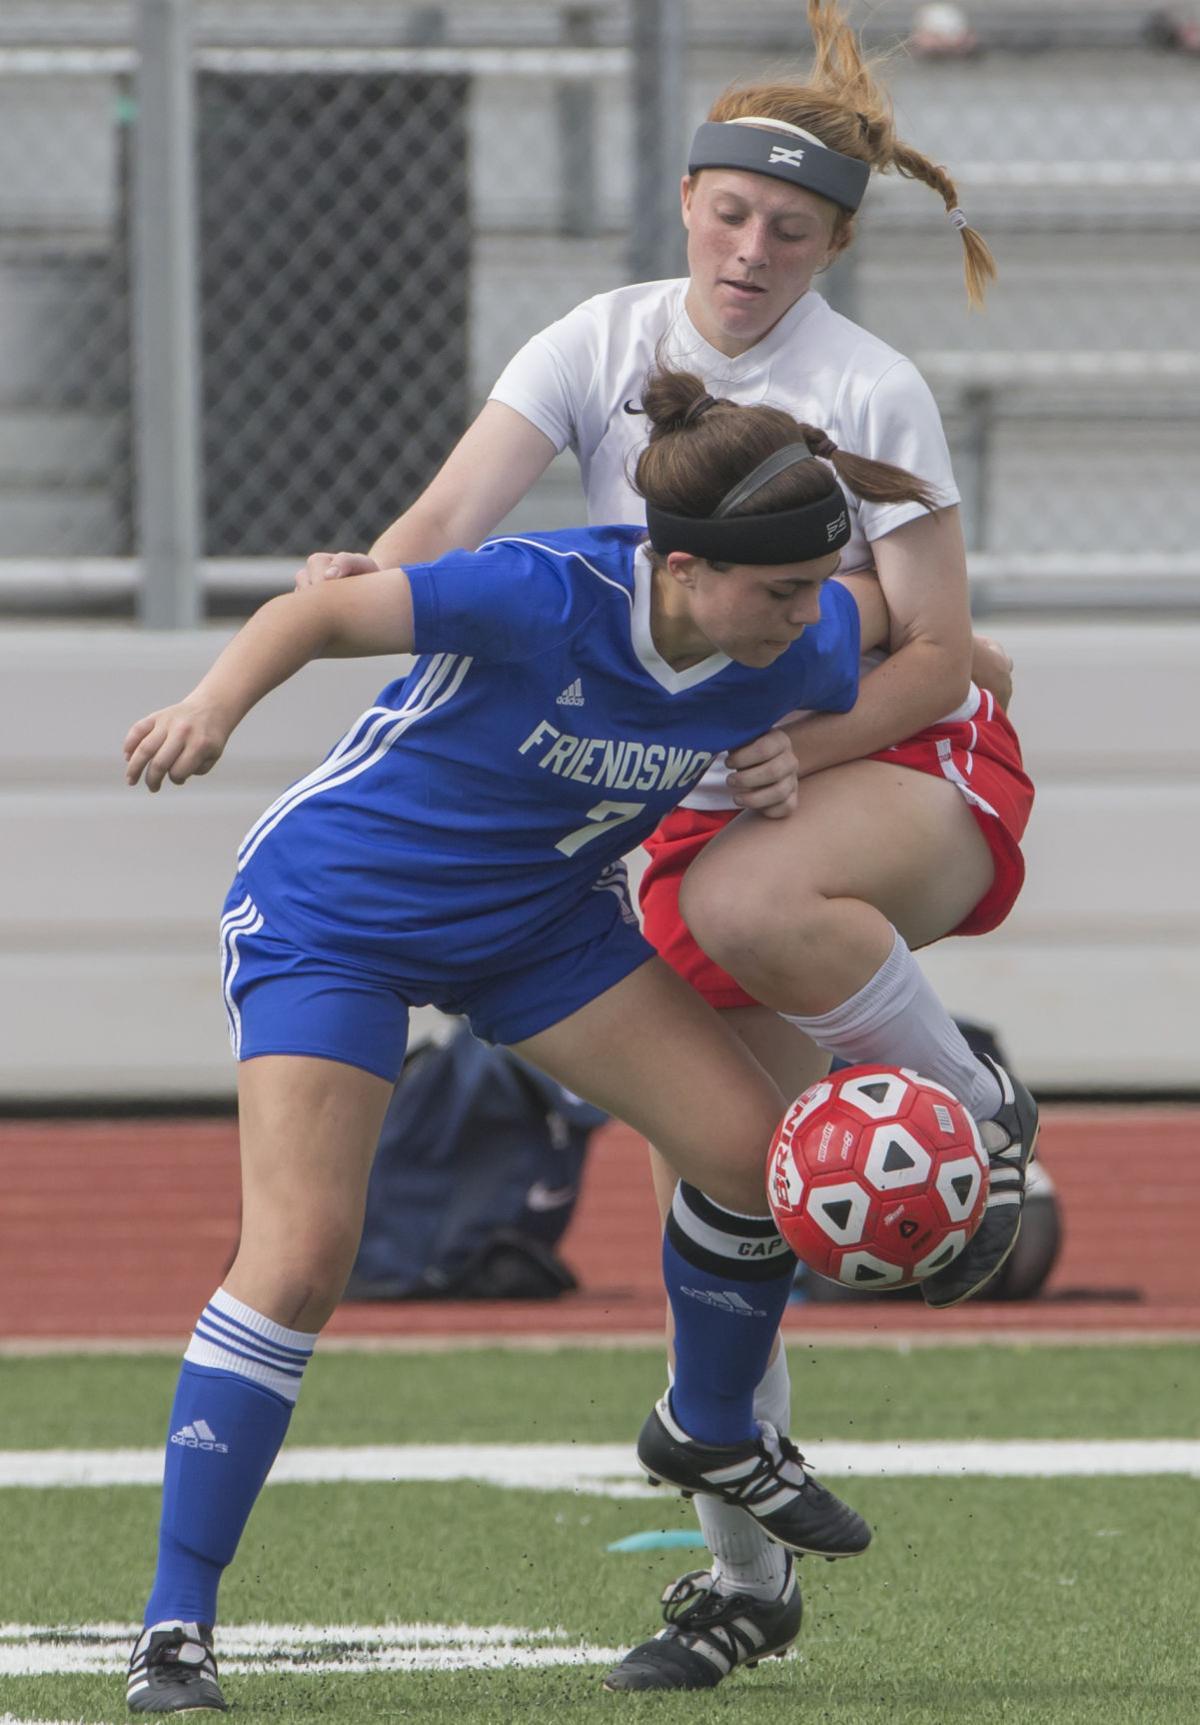 Clear Lake vs Friendswood Girls Soccer